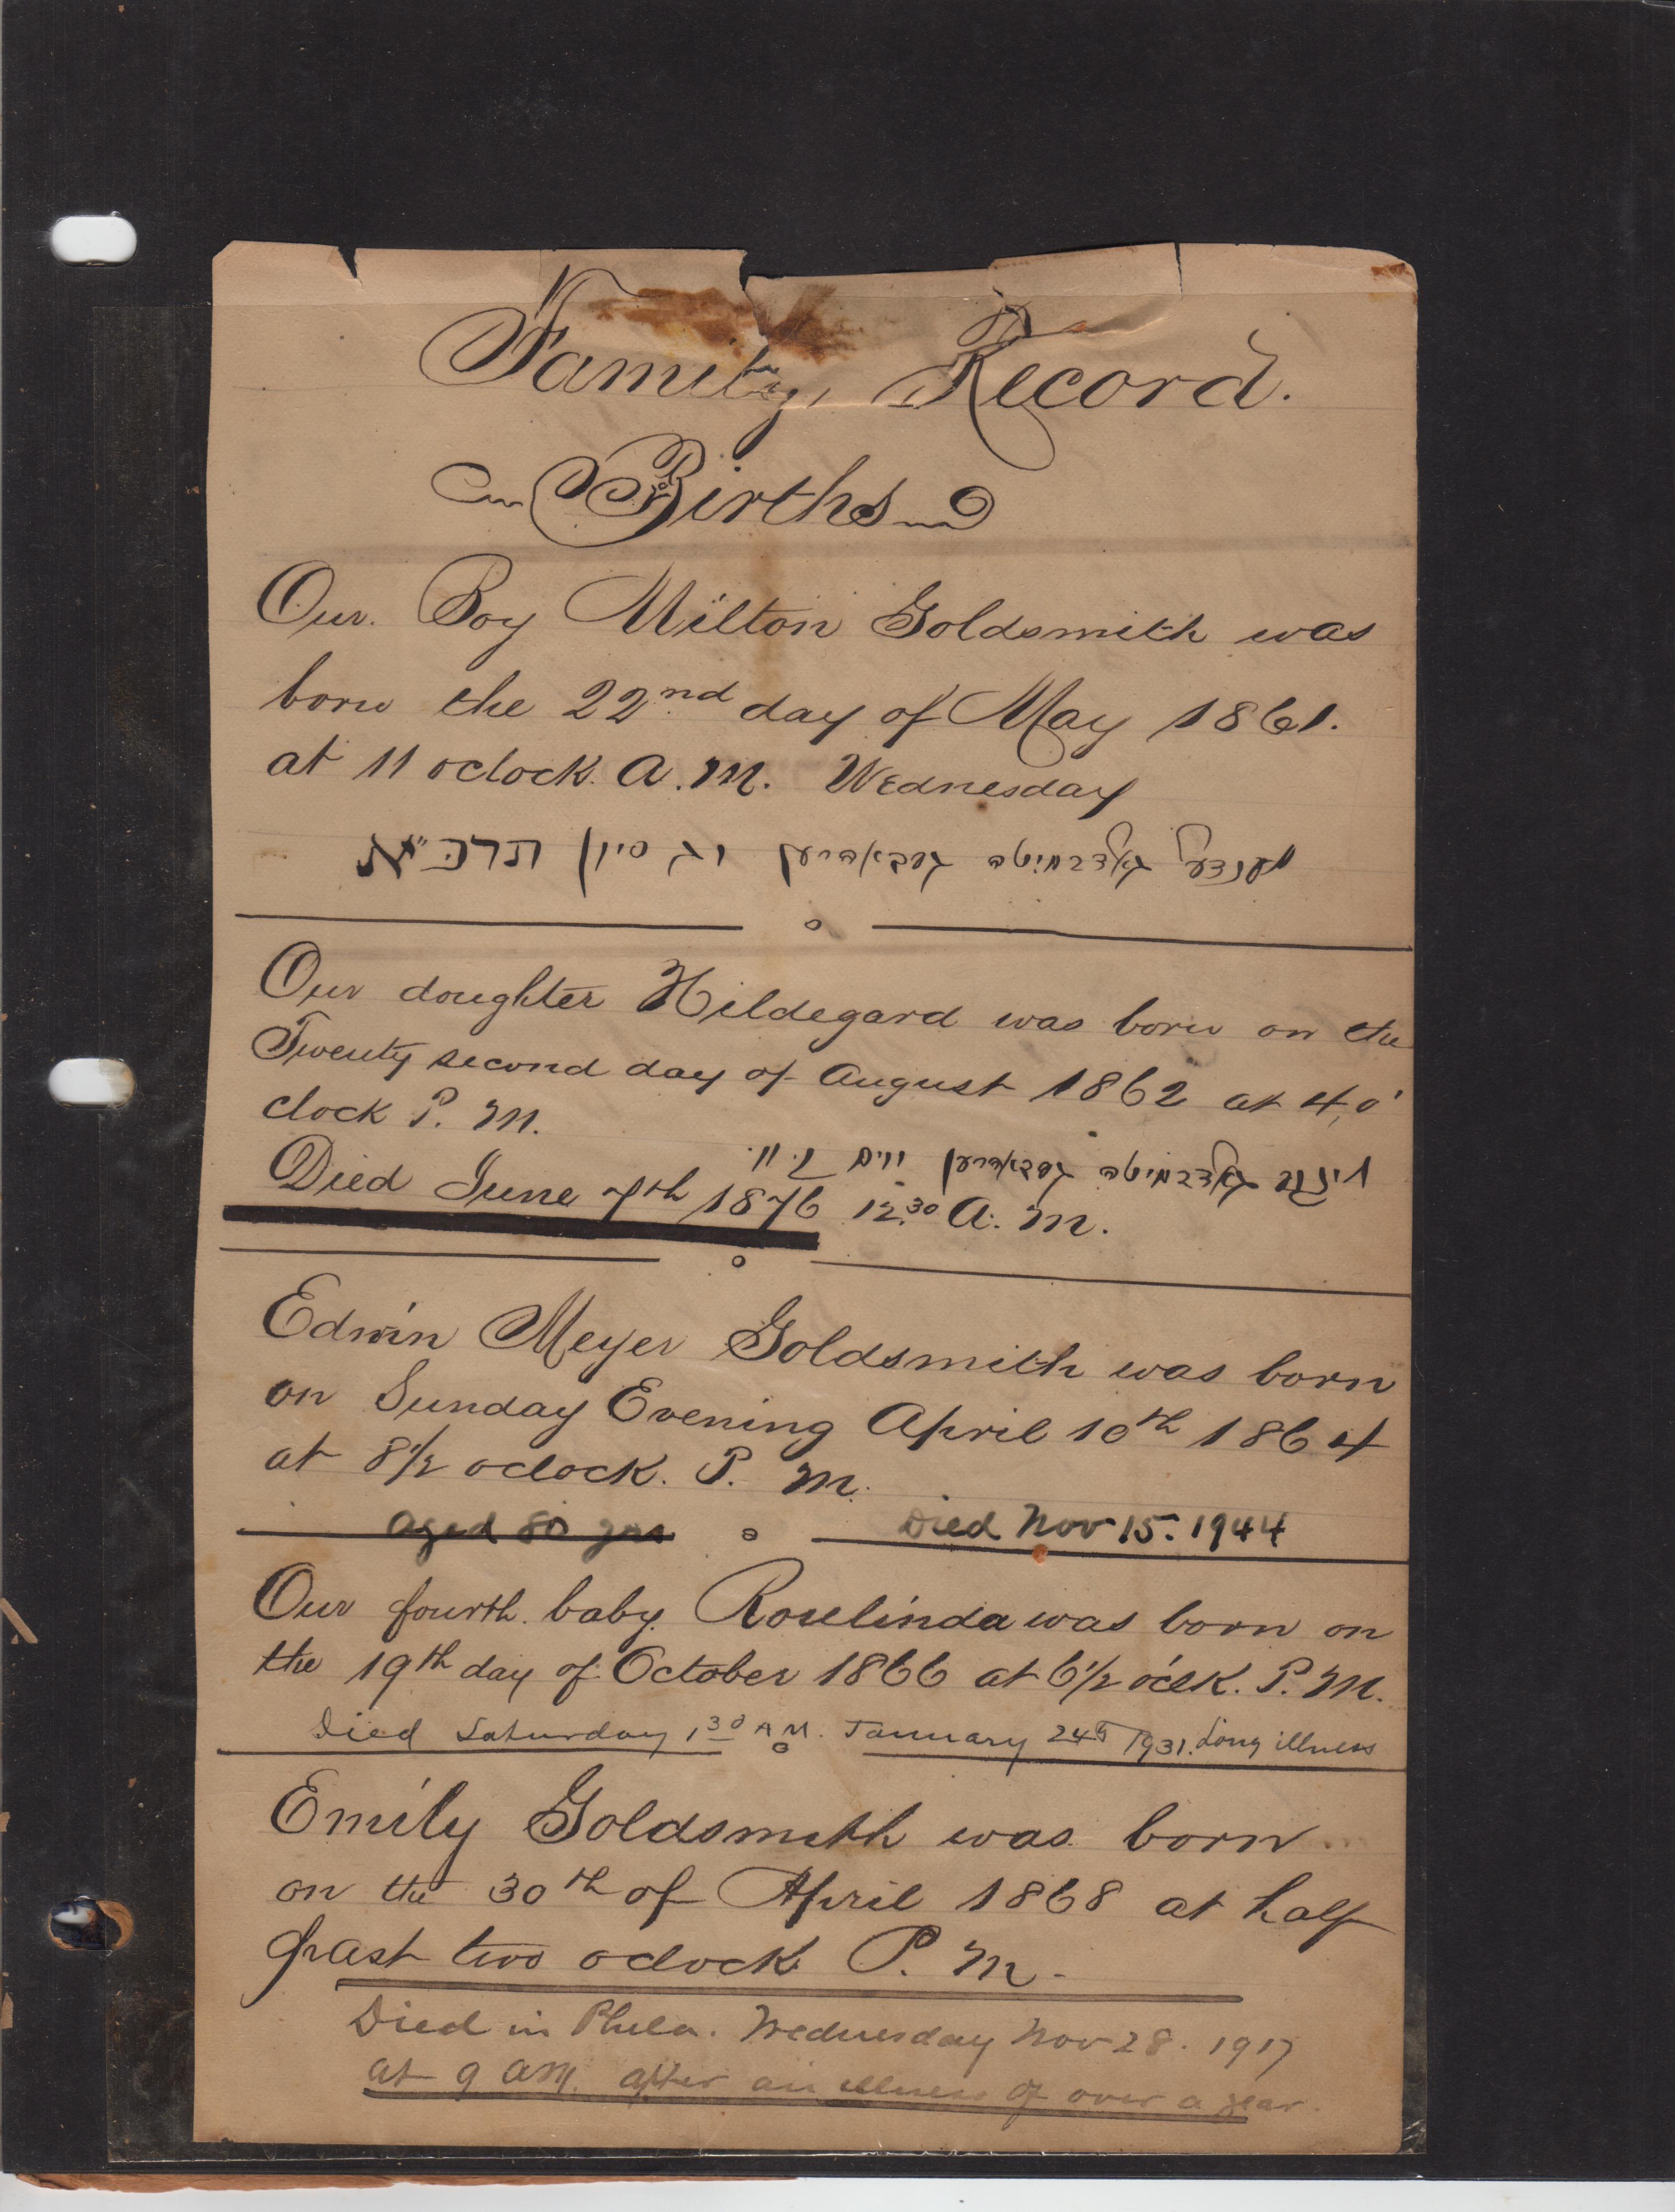 Milton Goldsmith's Family Album, Part VIII: Birth Records